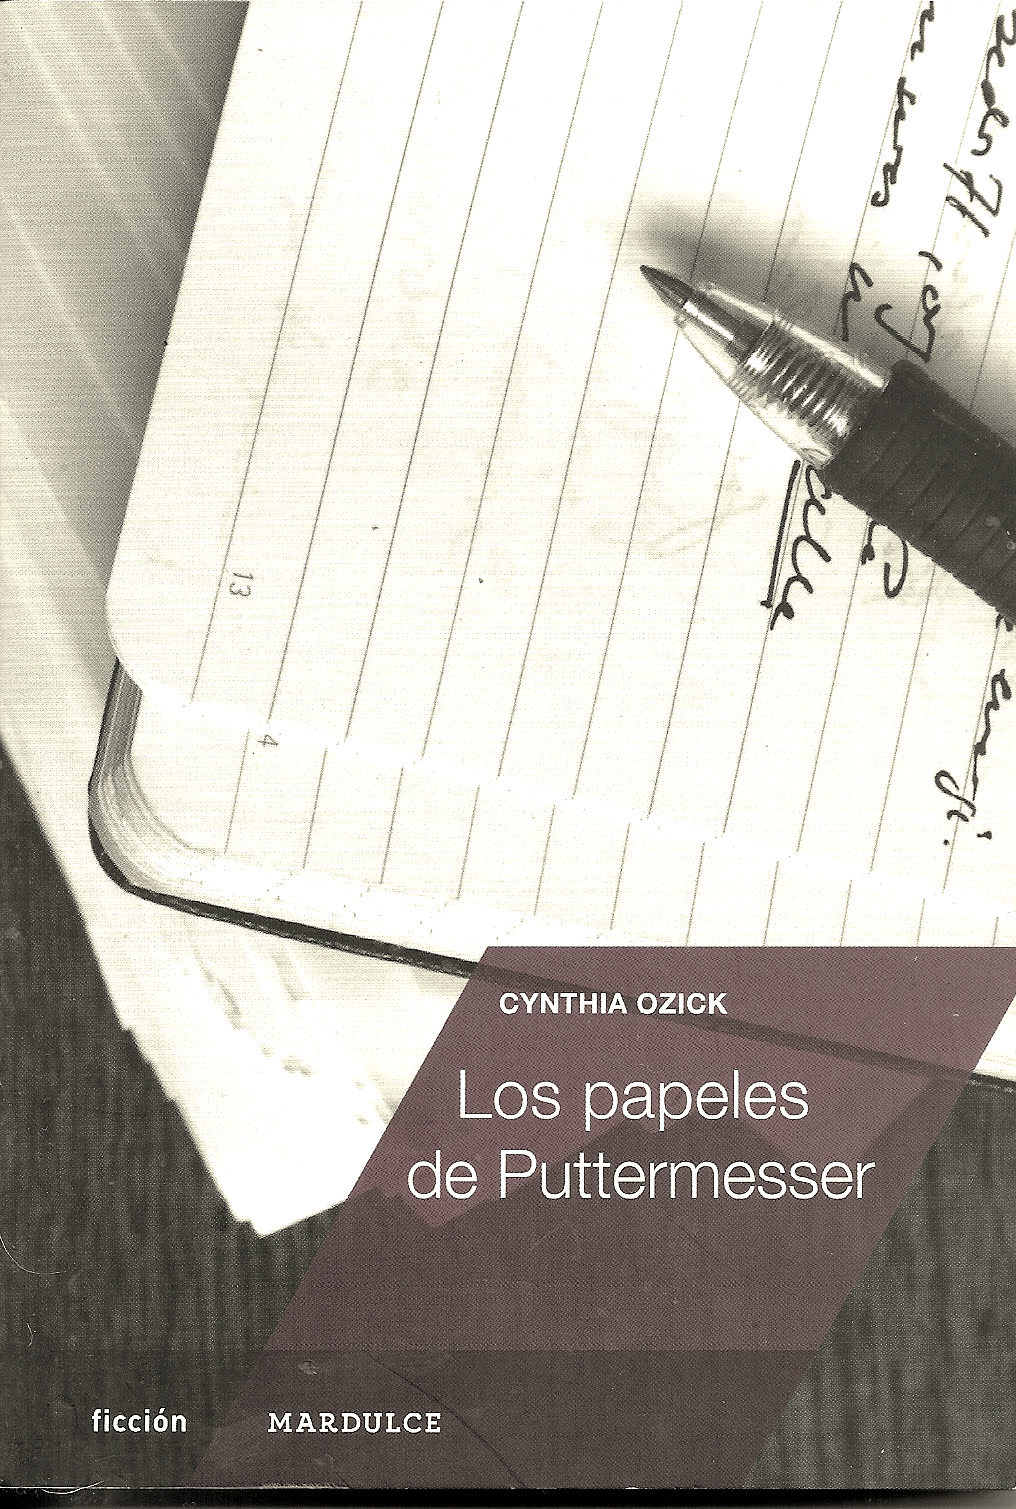 Los papeles de Puttermesser bn - Cynthia Ozick